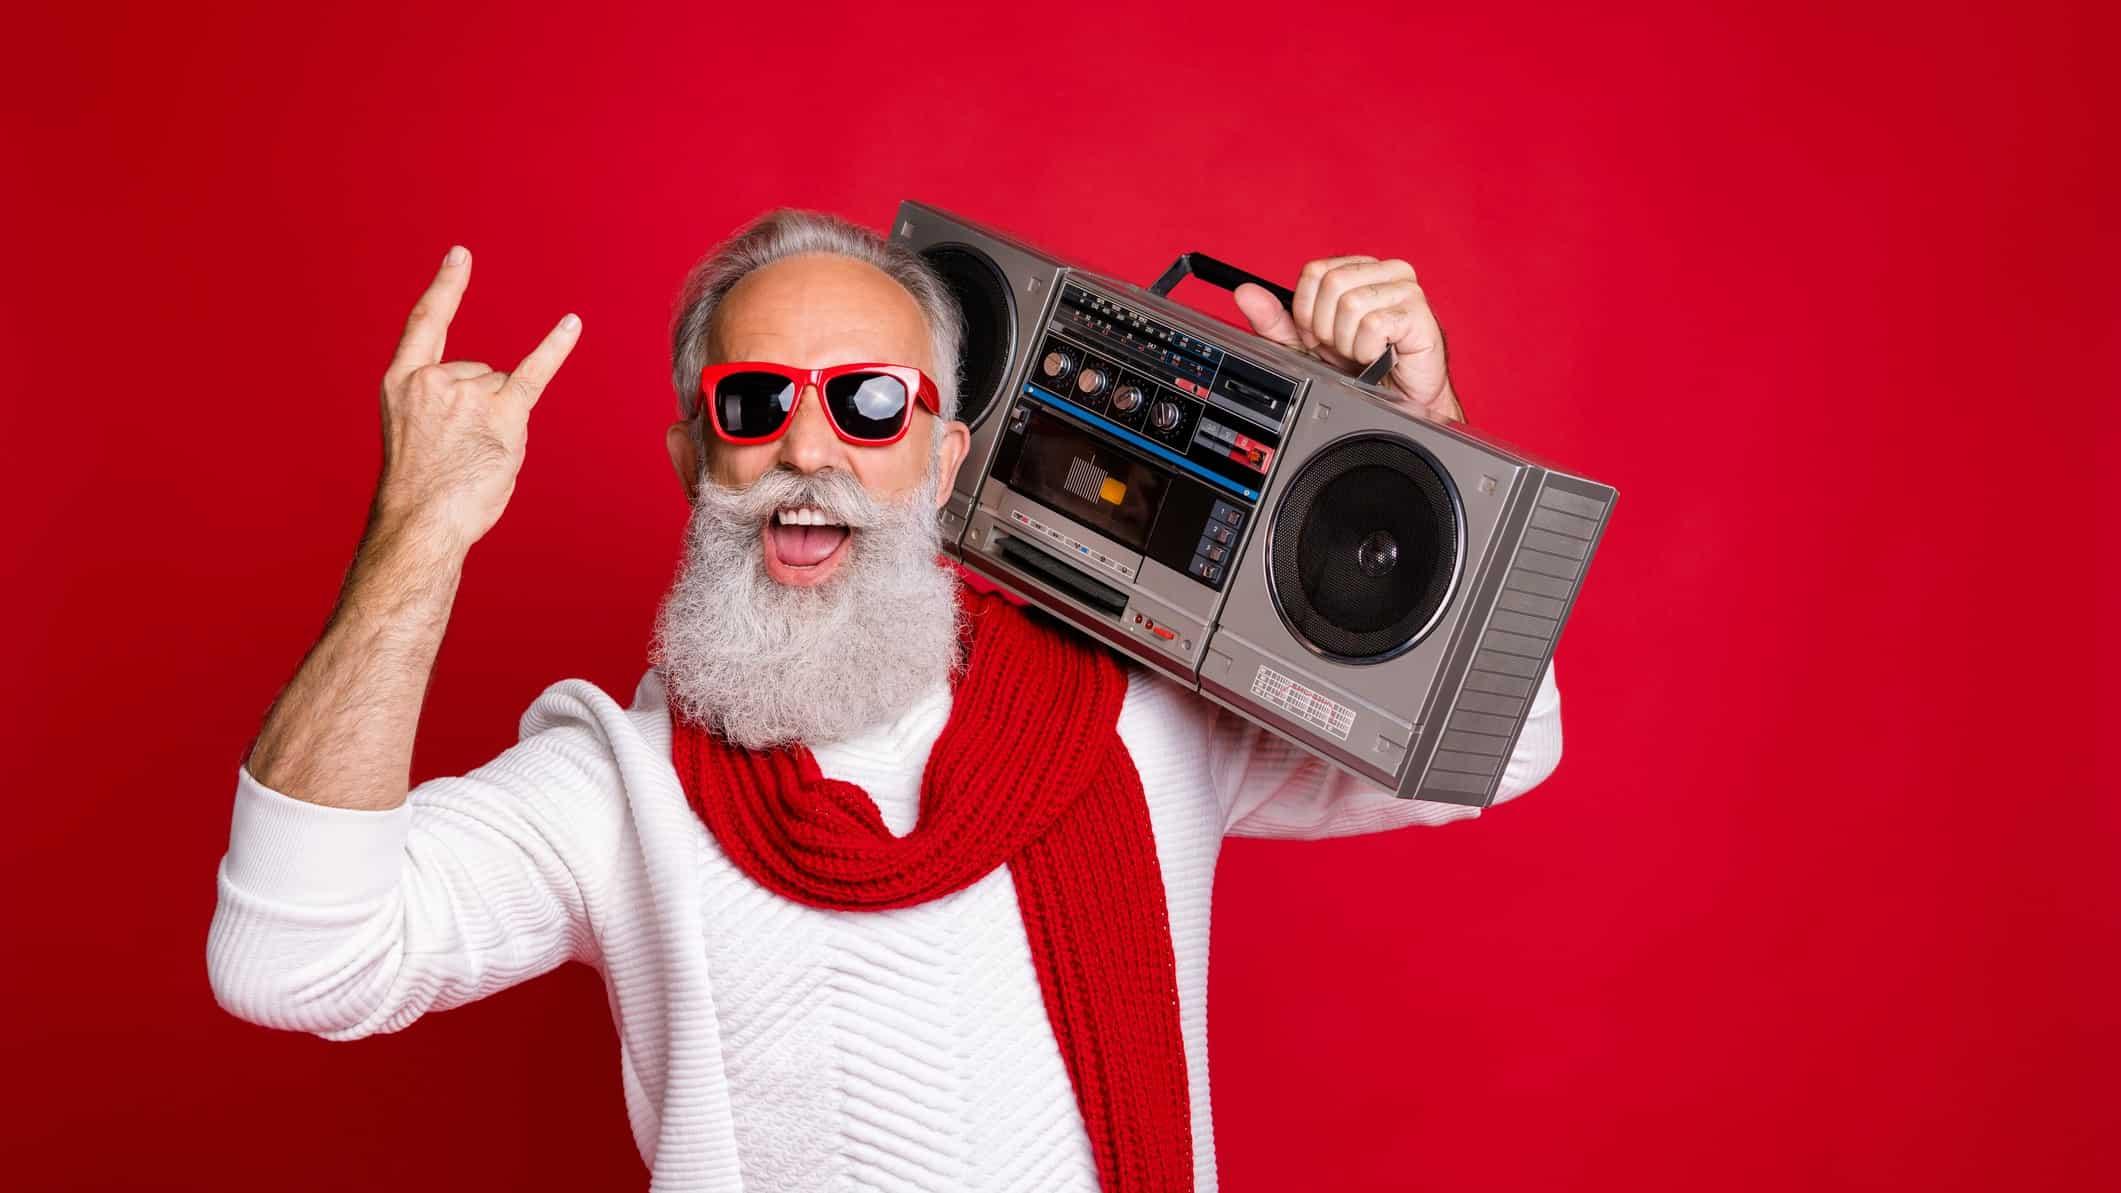 jb share price christmas boom represented by santa holding a hi-fi stereo